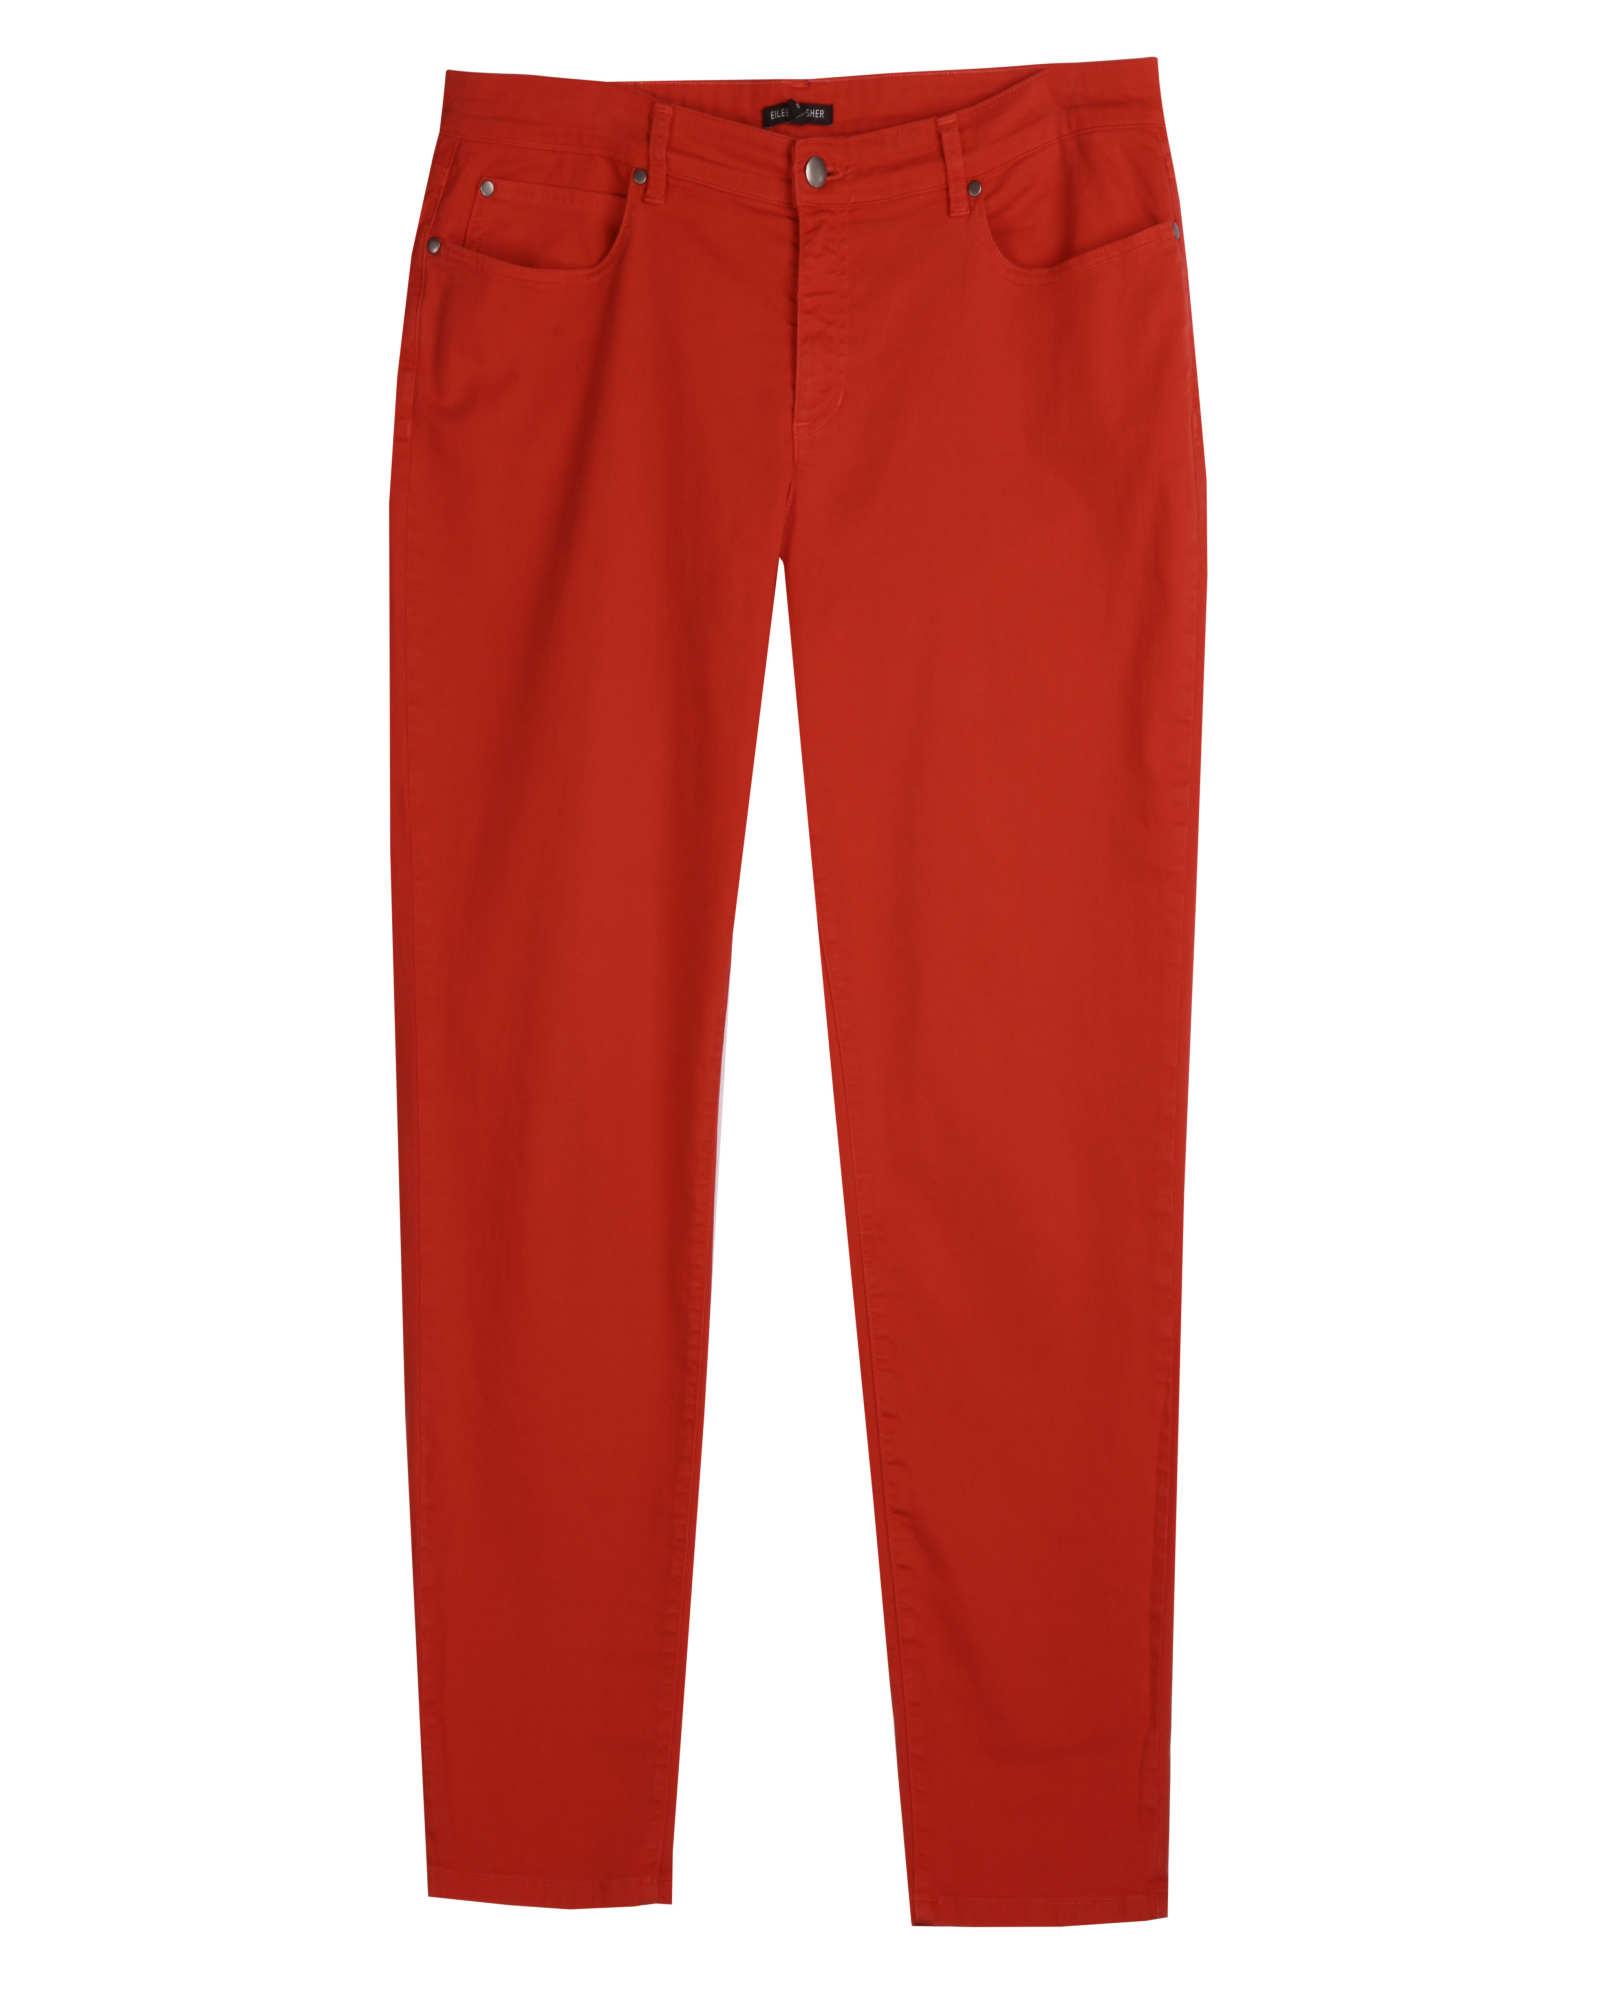 Garment Dyed Organic Cotton Stretch Denim Pant